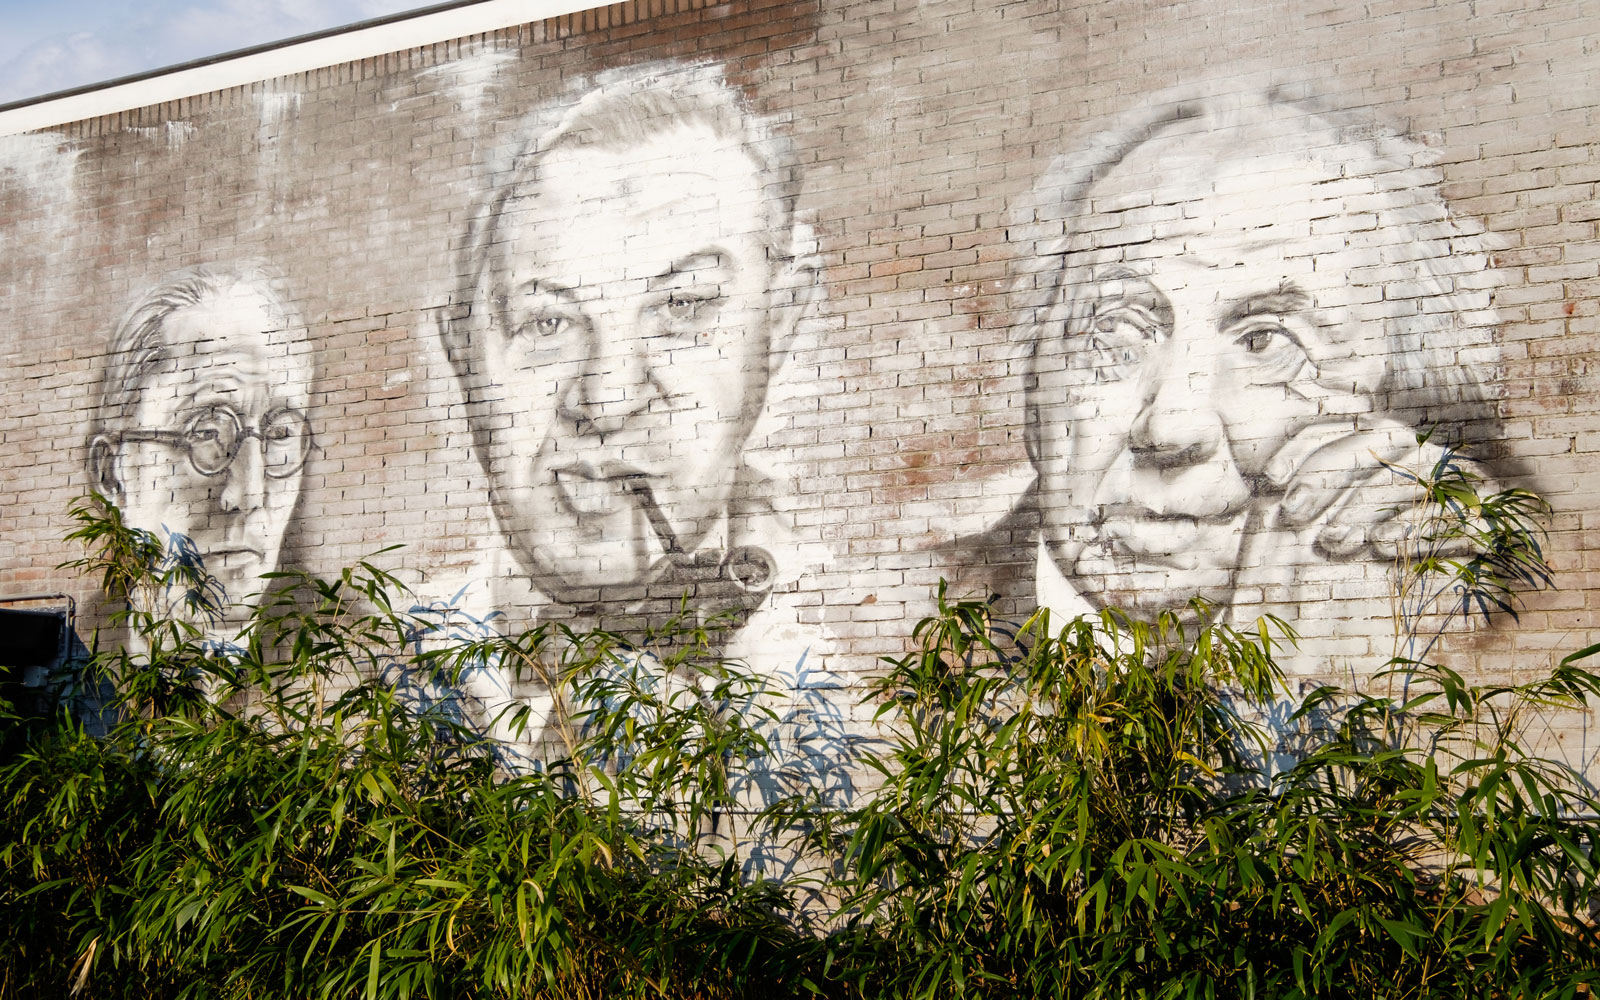 Muurschildering, graffiti, kunst, Le Corbusier, Arne Jacobsen, Frank Lloyd Wright, showroom, architectenbureau Kabaz